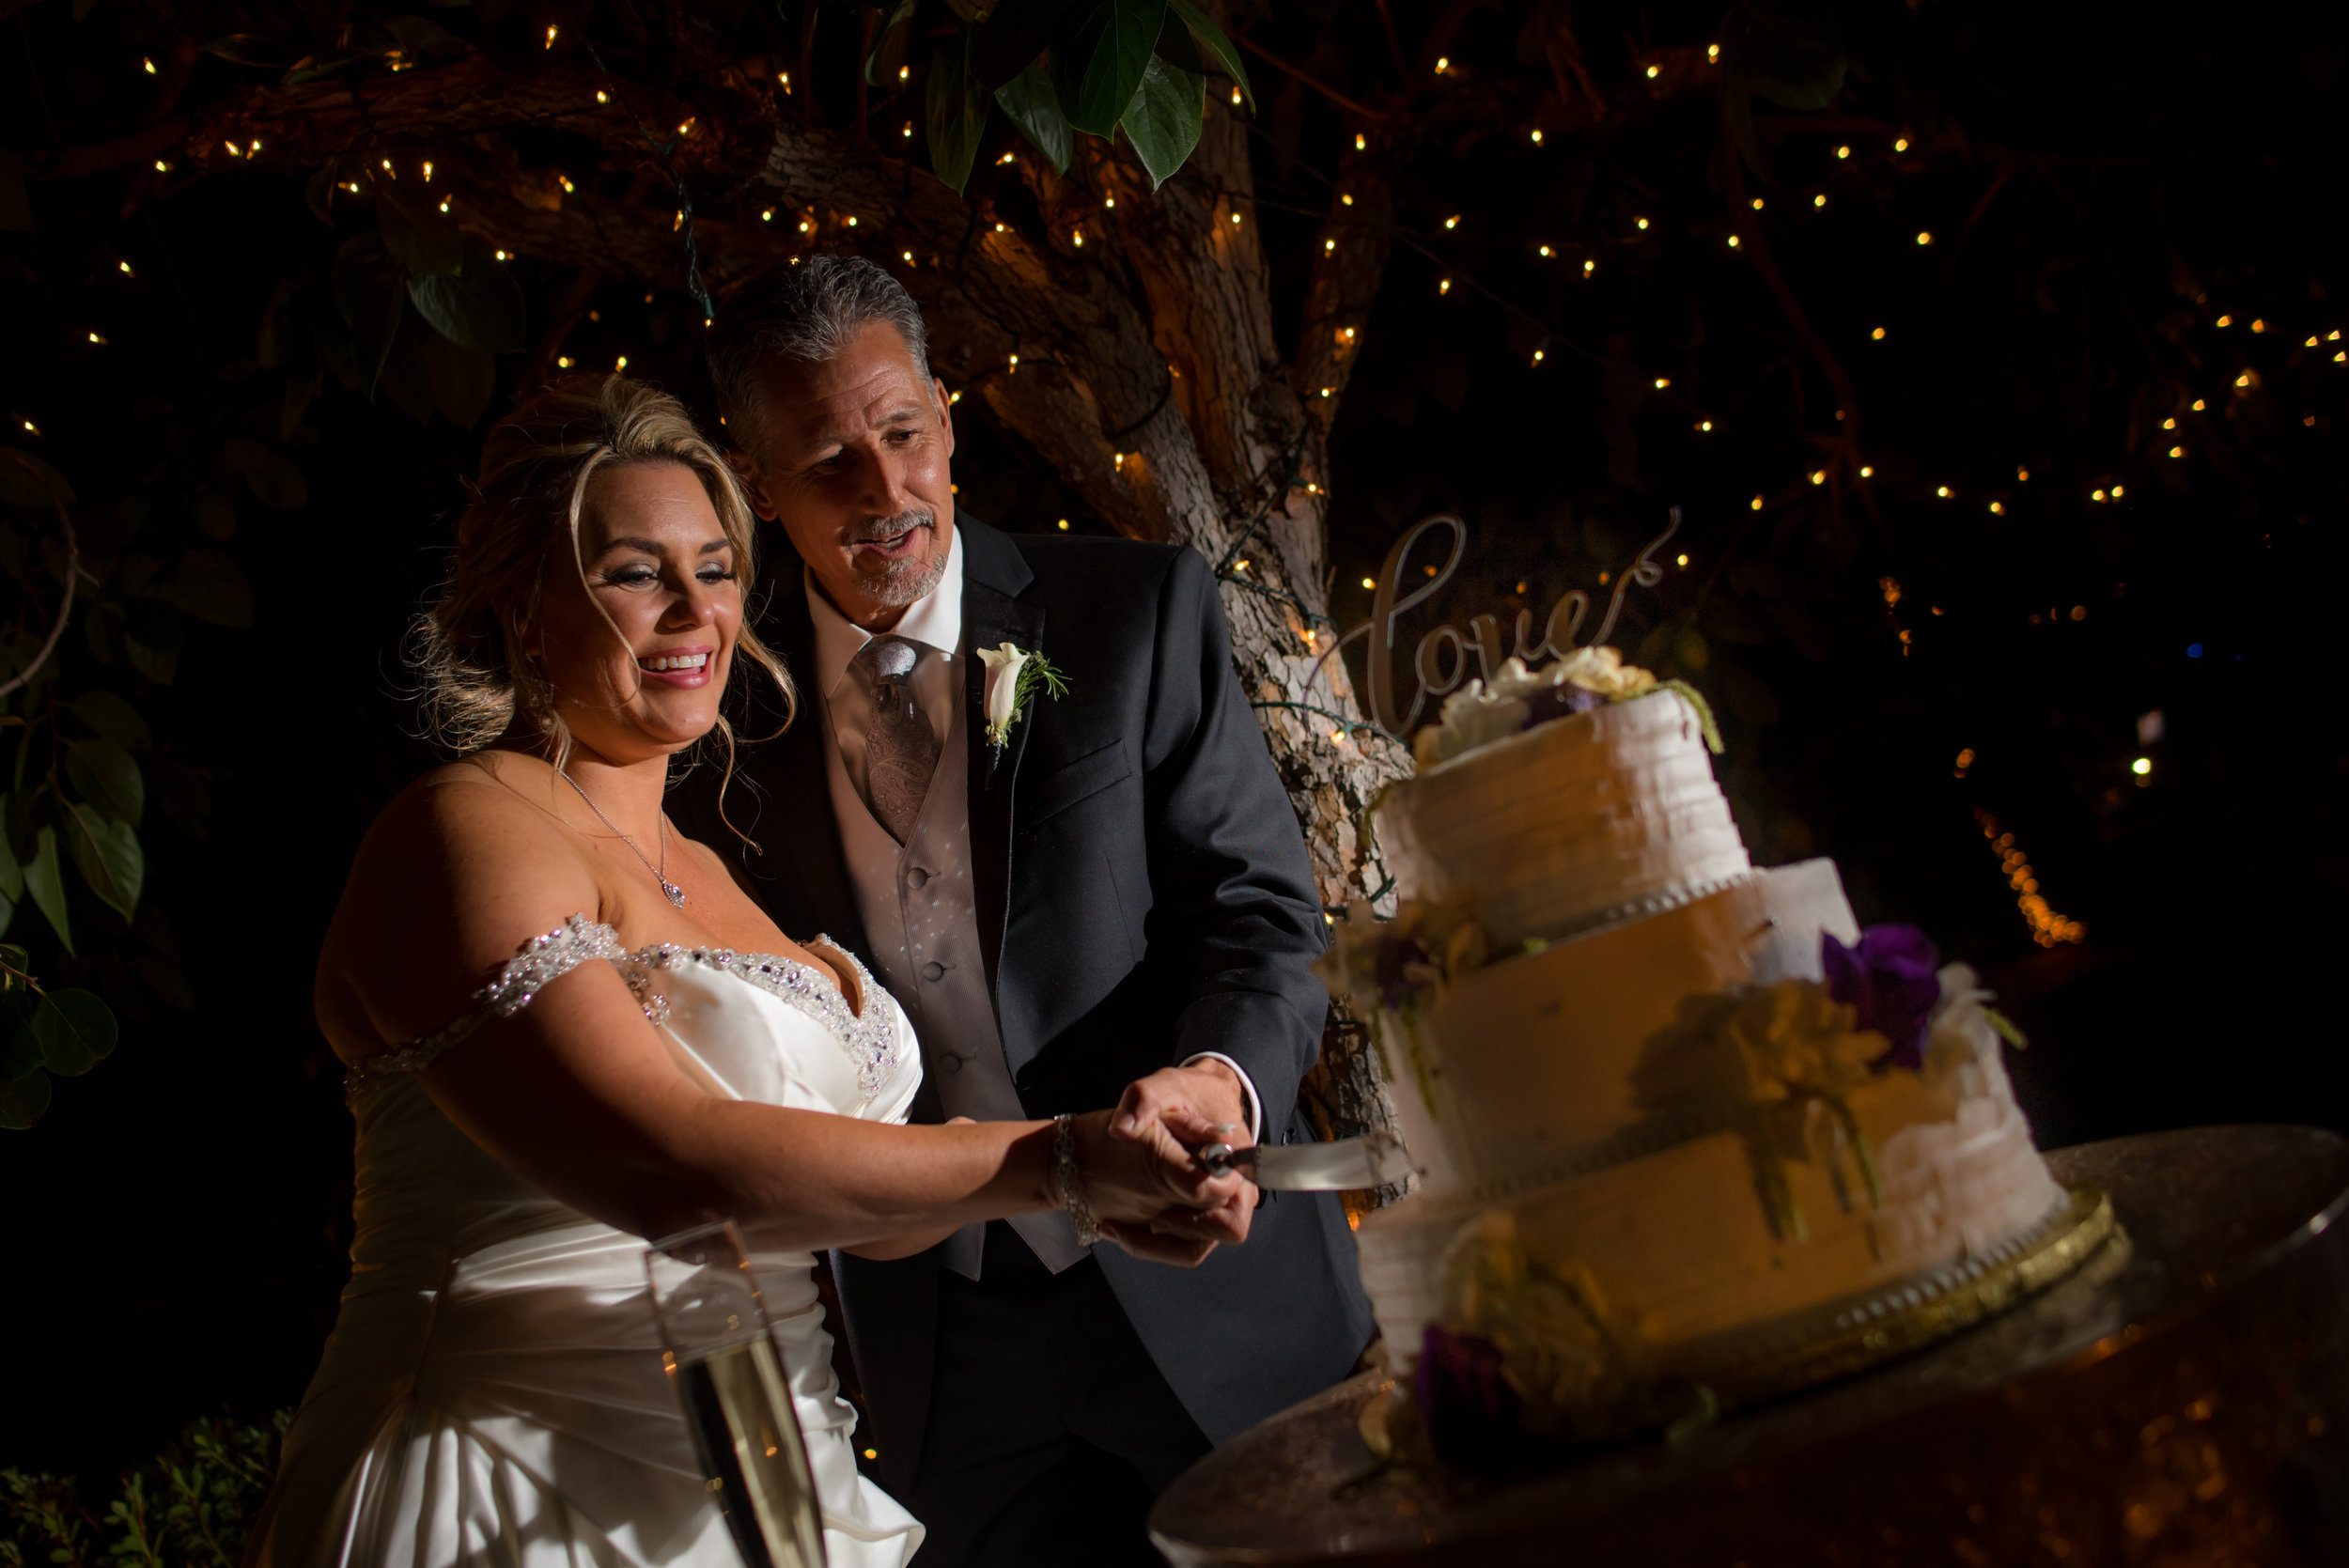 kara-craig-048-monte-verde-inn-sacramento-wedding-photographer-katherine-nicole-photography.JPG